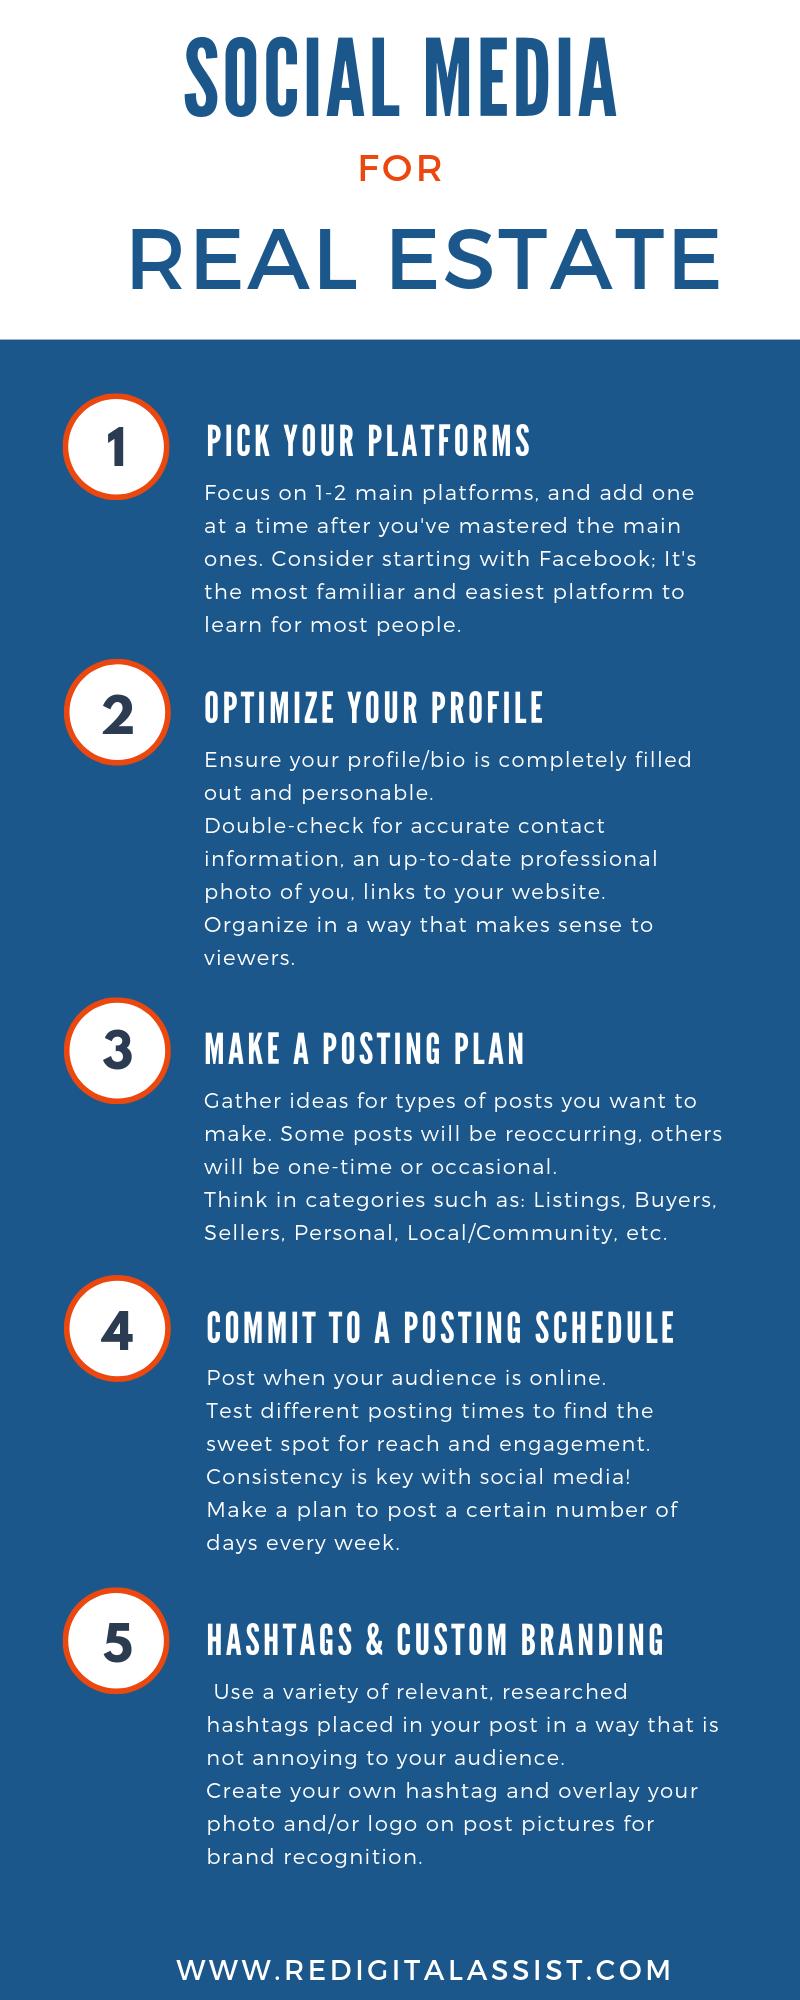 5 Quick Tips for Real Estate Social Media